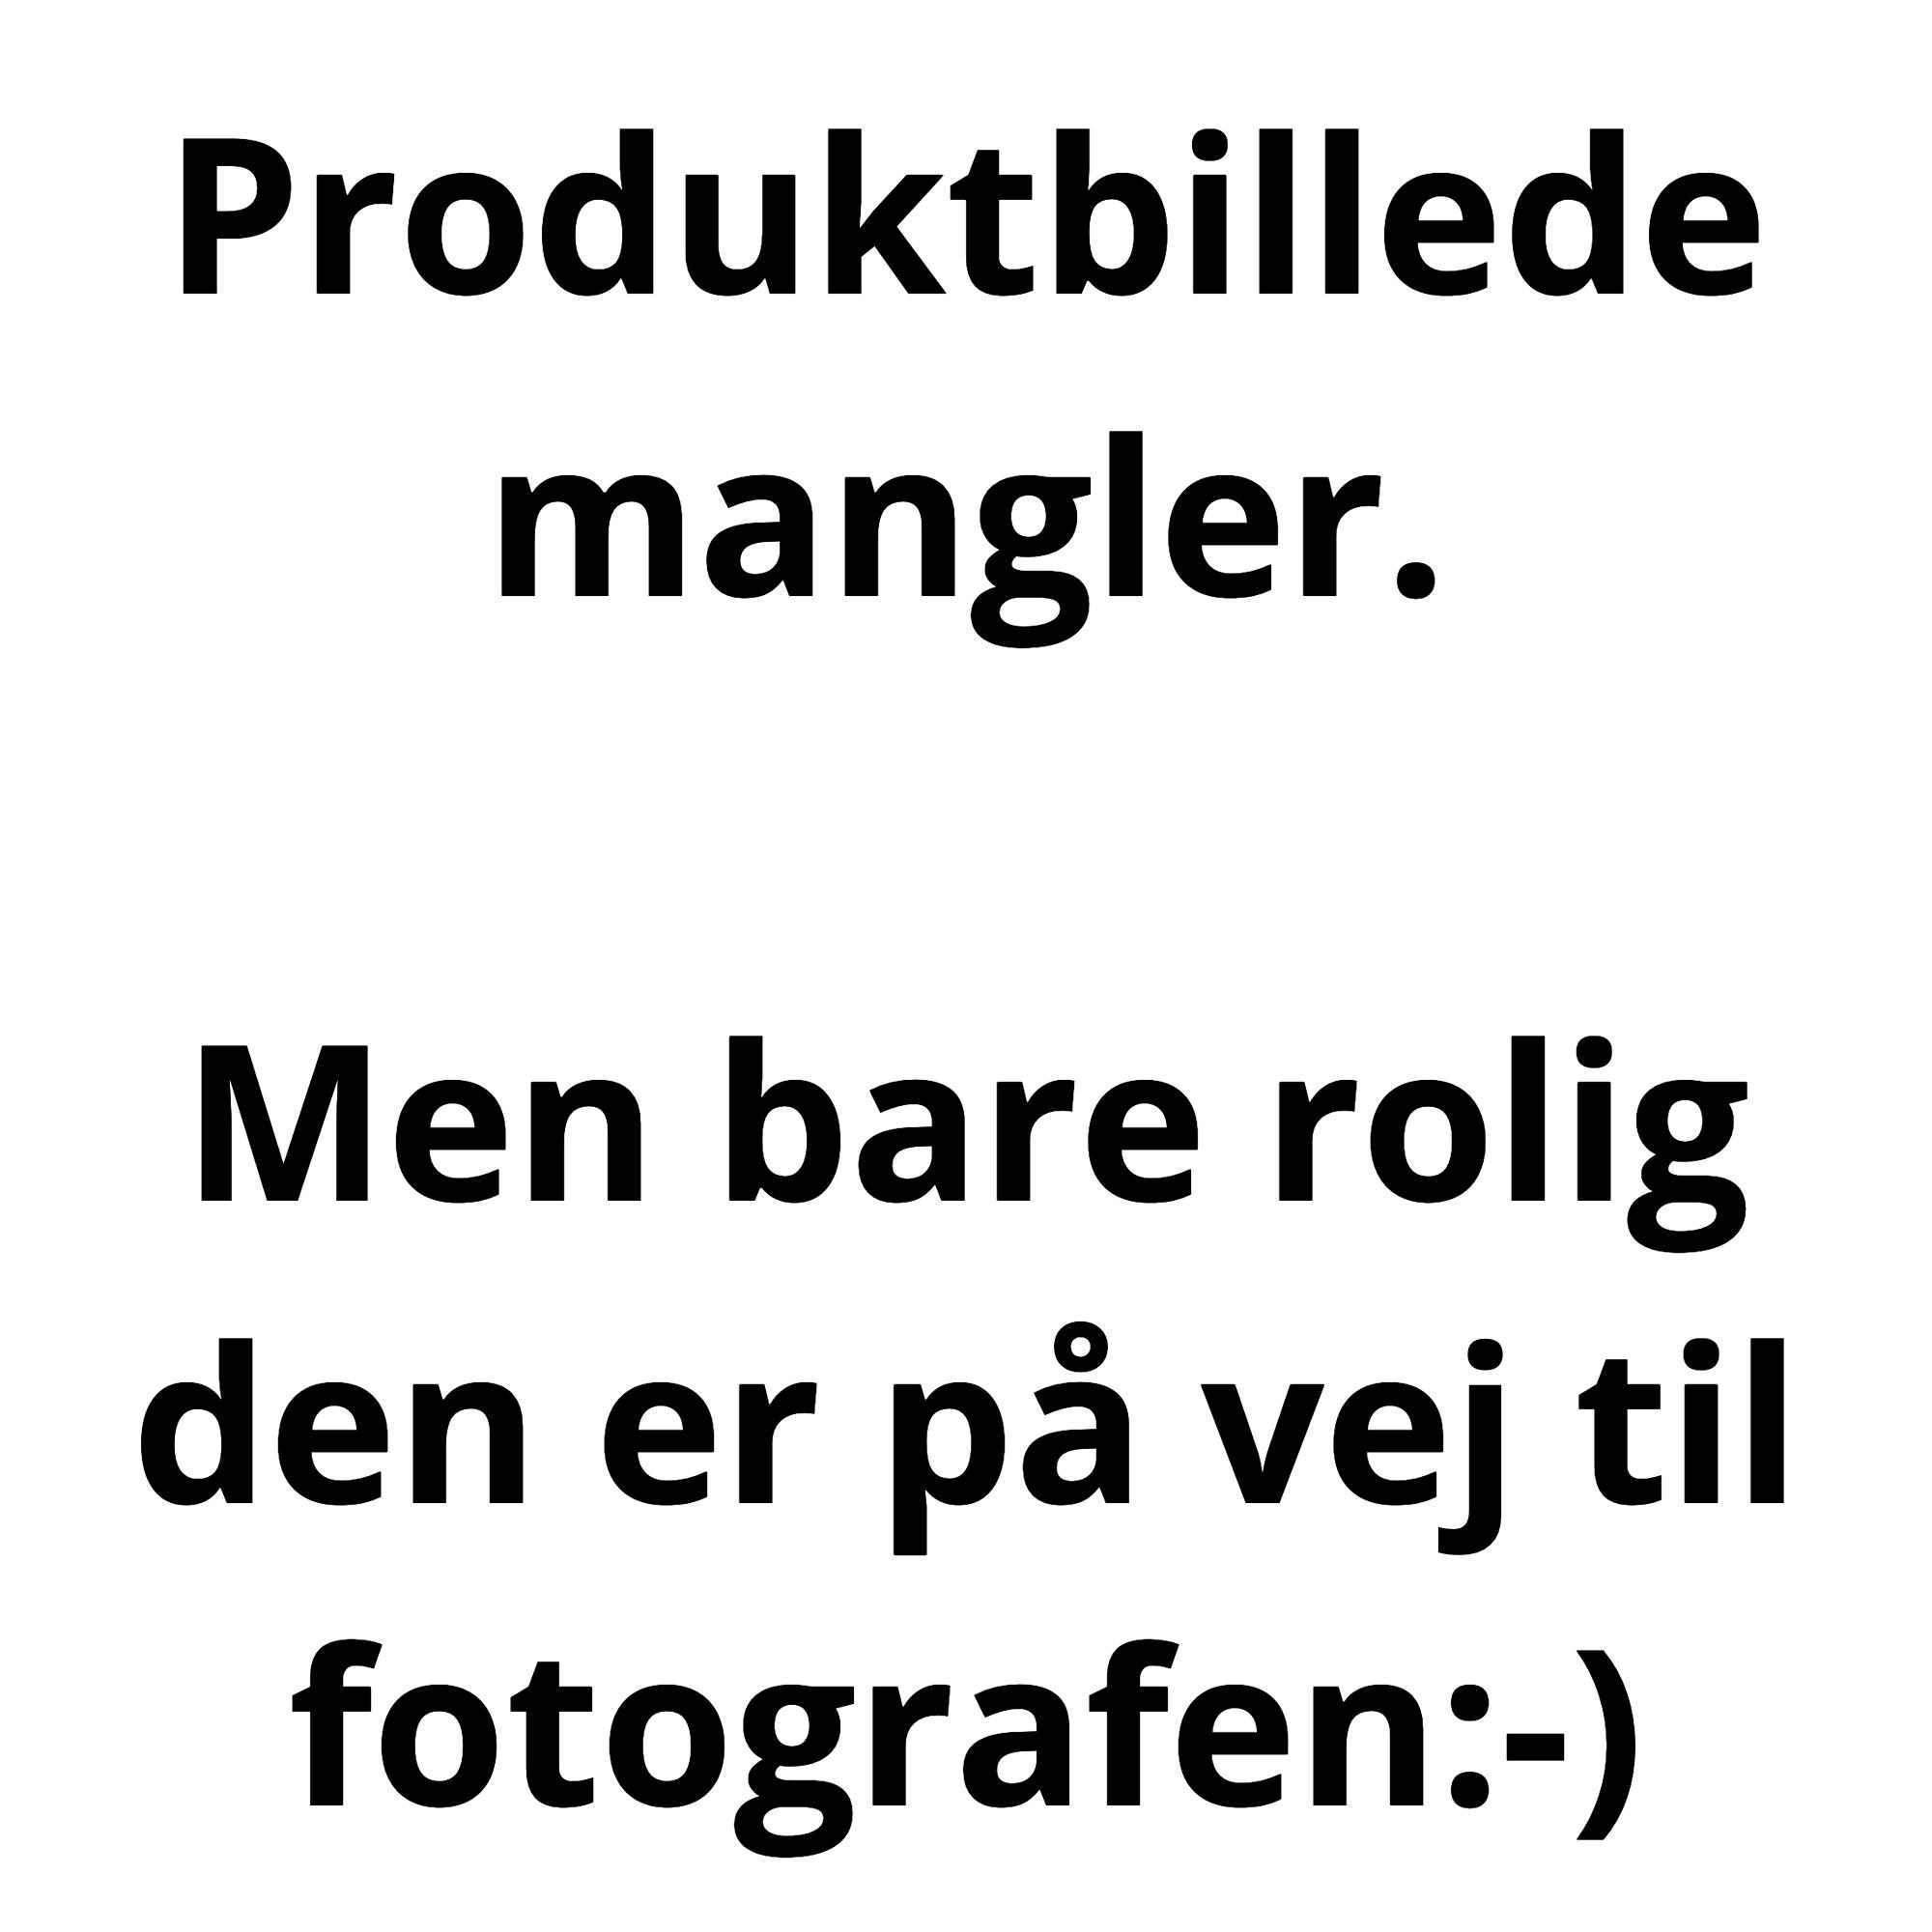 Brodit Passiv mobilholder til Apple iPhone 6S Plus/7 Plus/( Plus/ Xs max - 511804